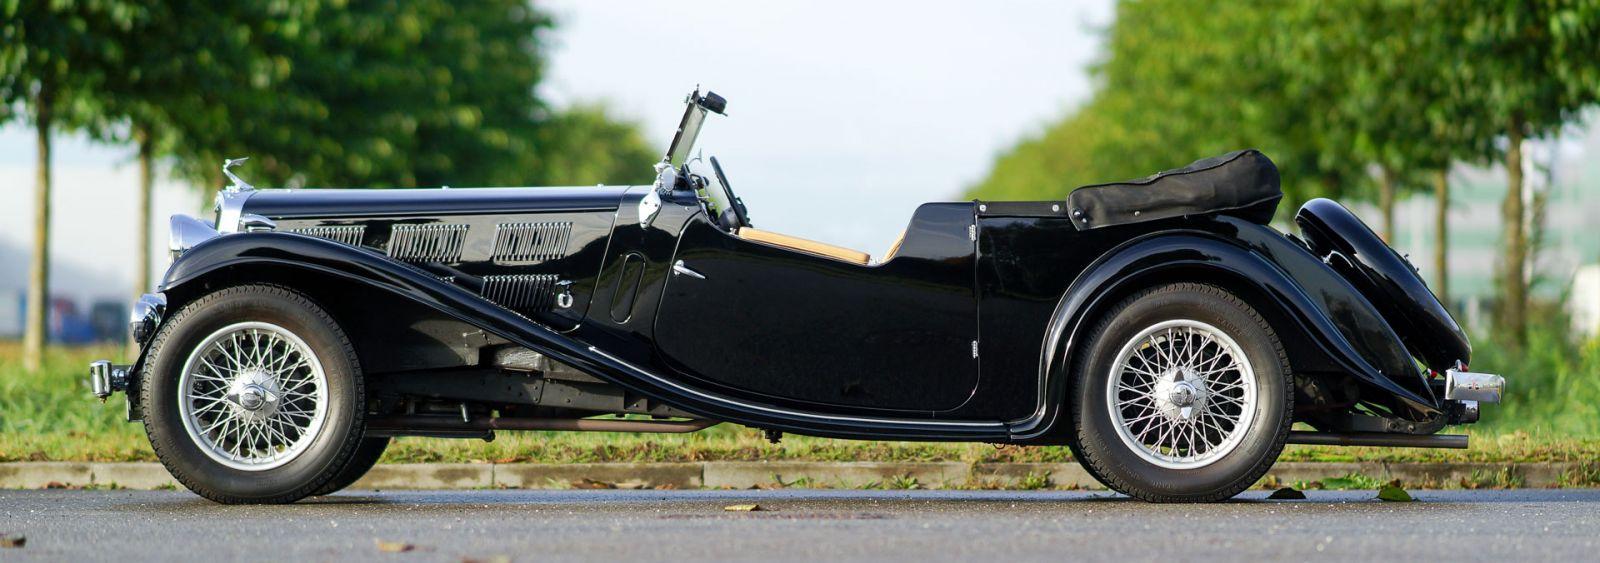 triumph gloria six tourer 1935 classicargarage fr. Black Bedroom Furniture Sets. Home Design Ideas